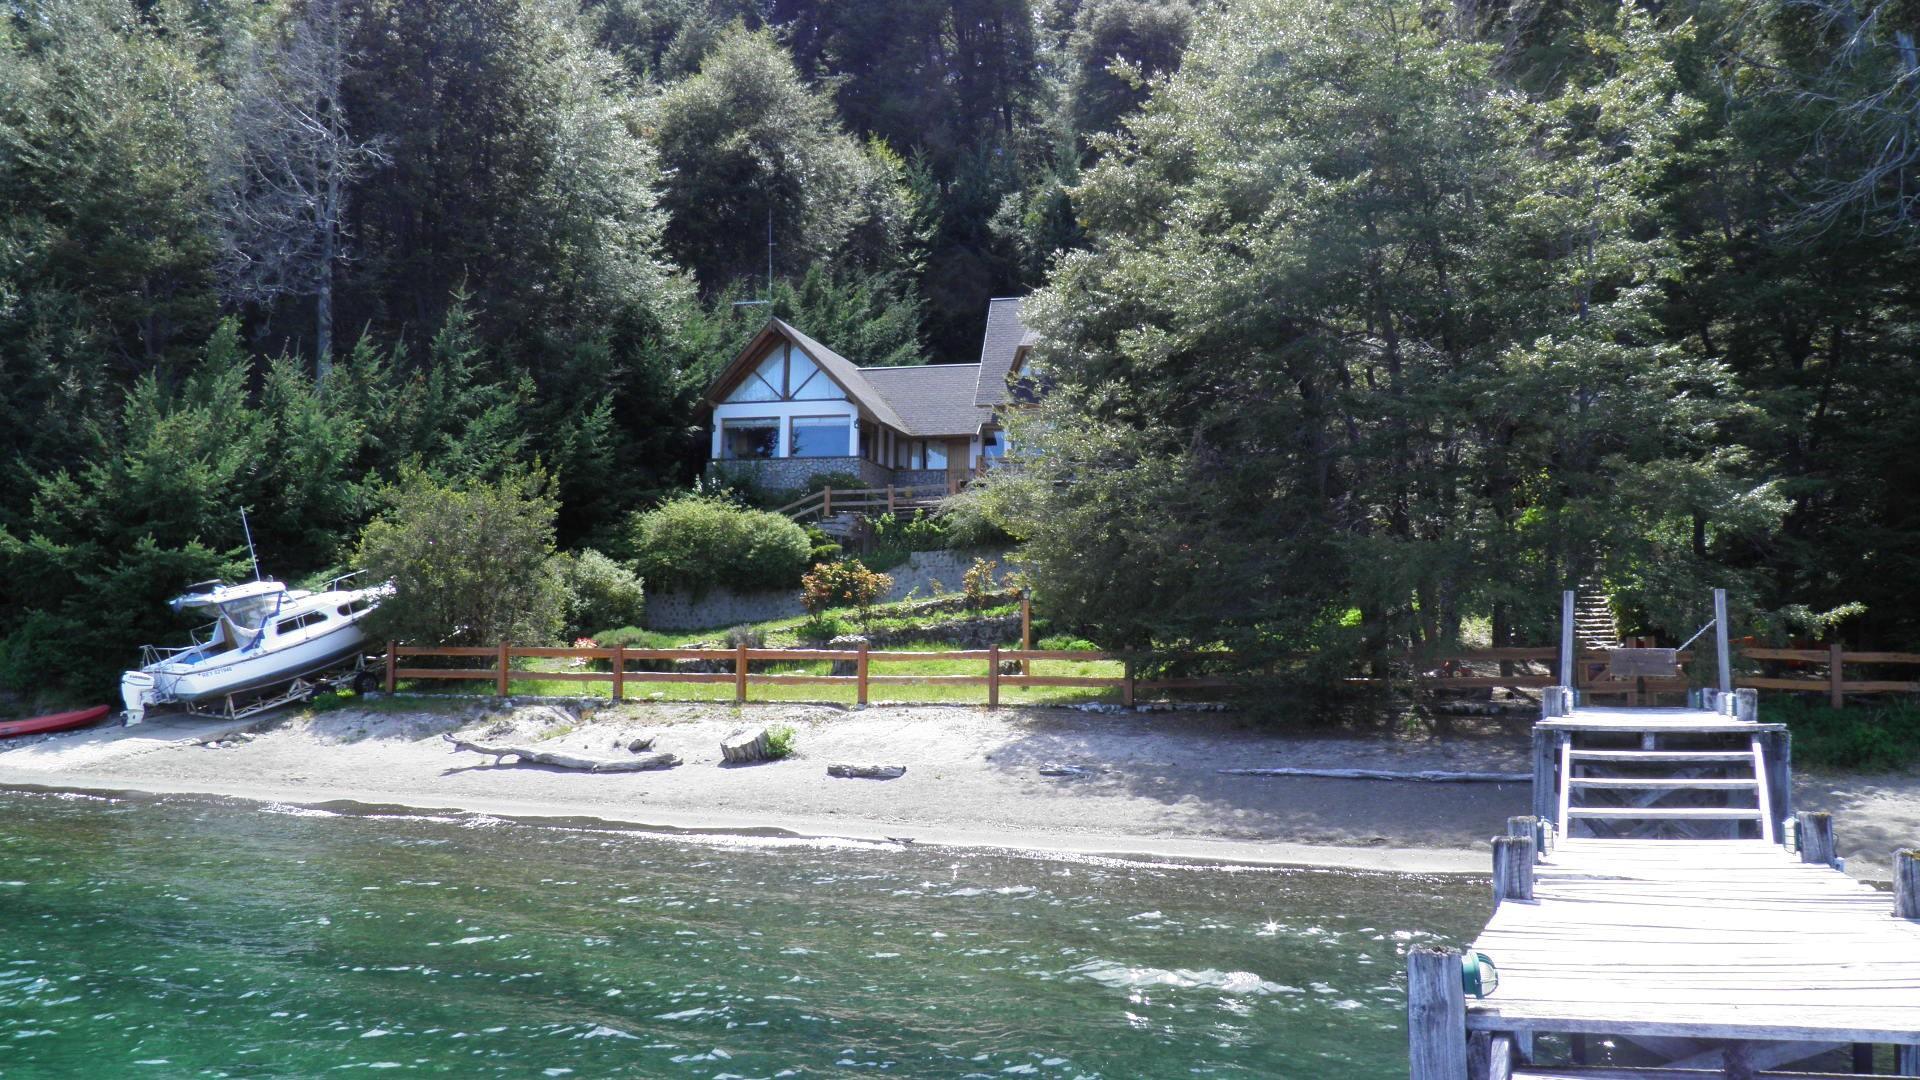 Casa con costa y vista al lago Nahuel Huapi, Villa la Angostura